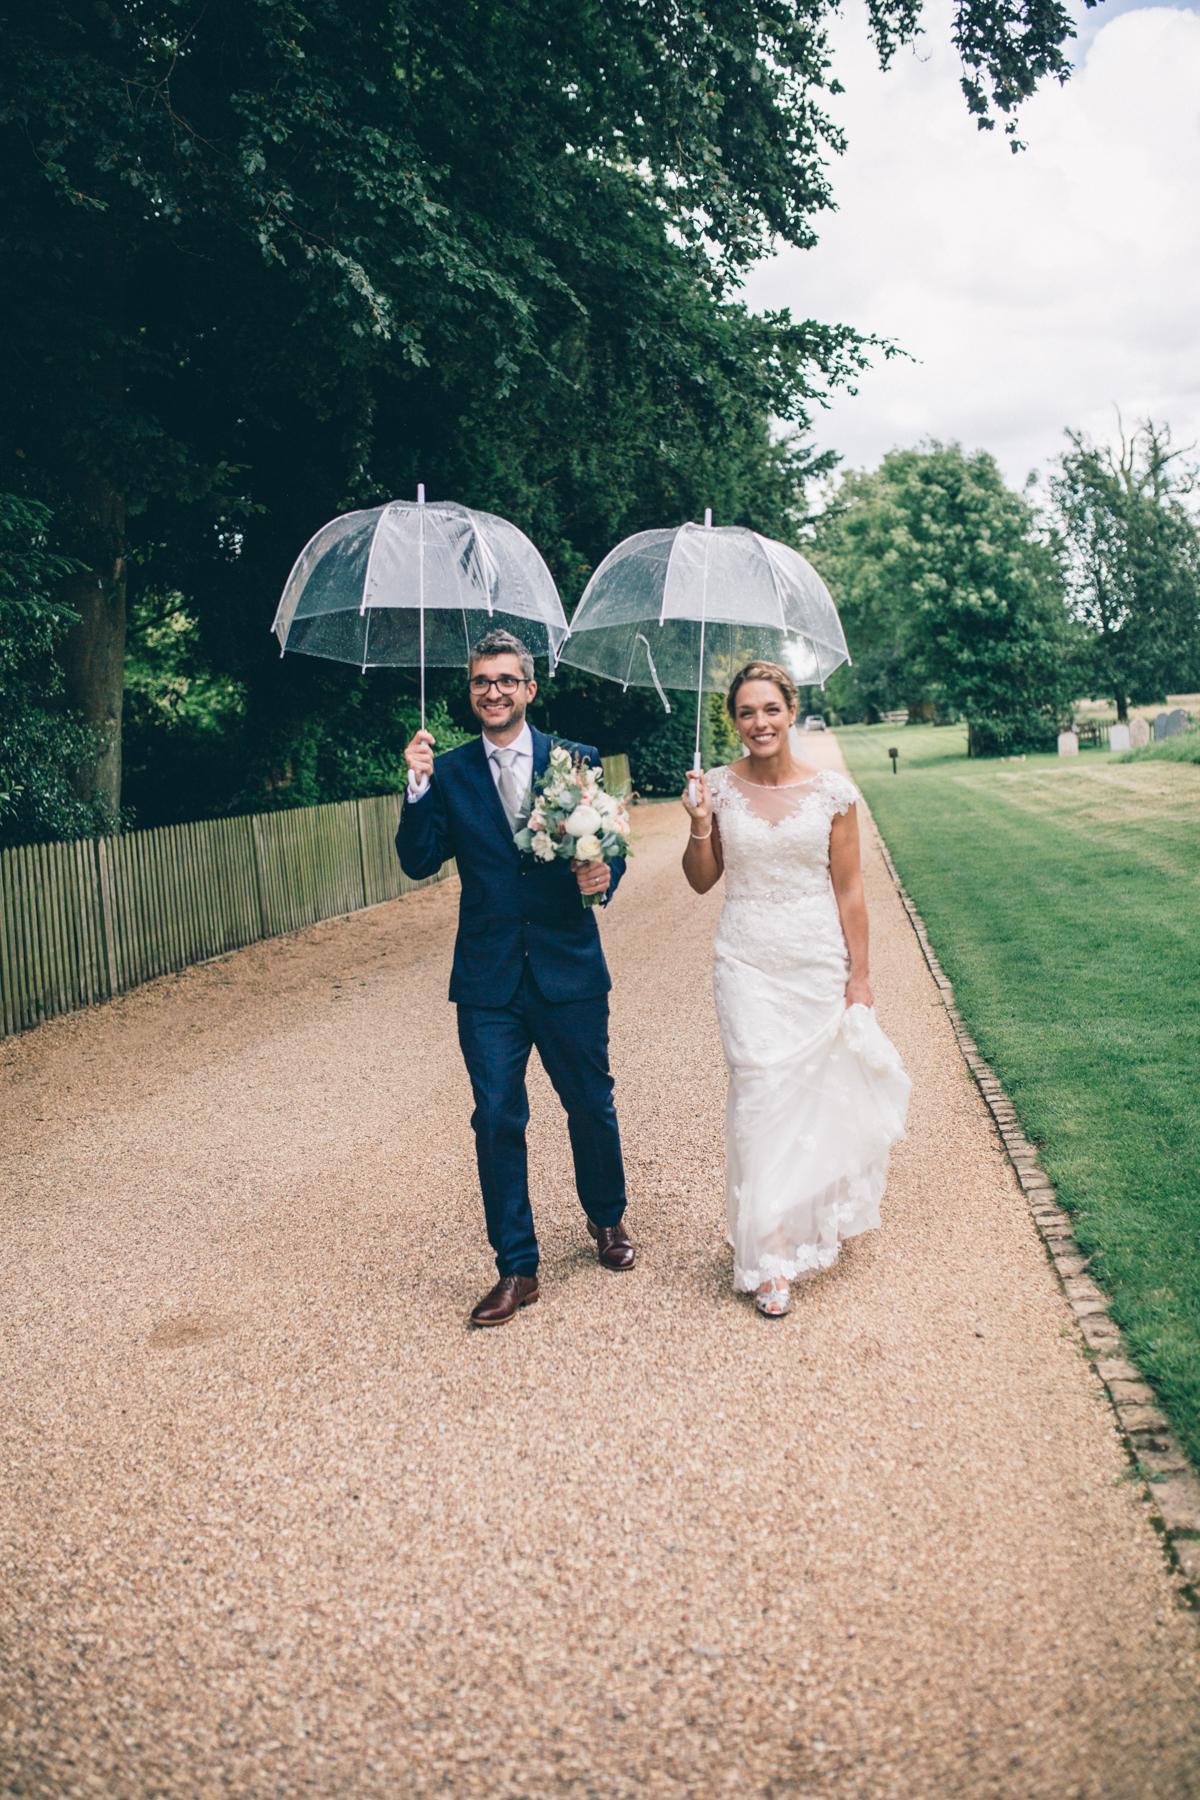 Sarah + Caco Tipi Village Green Wedding Buckinghamshire NaomiJanePhotography-60.jpg